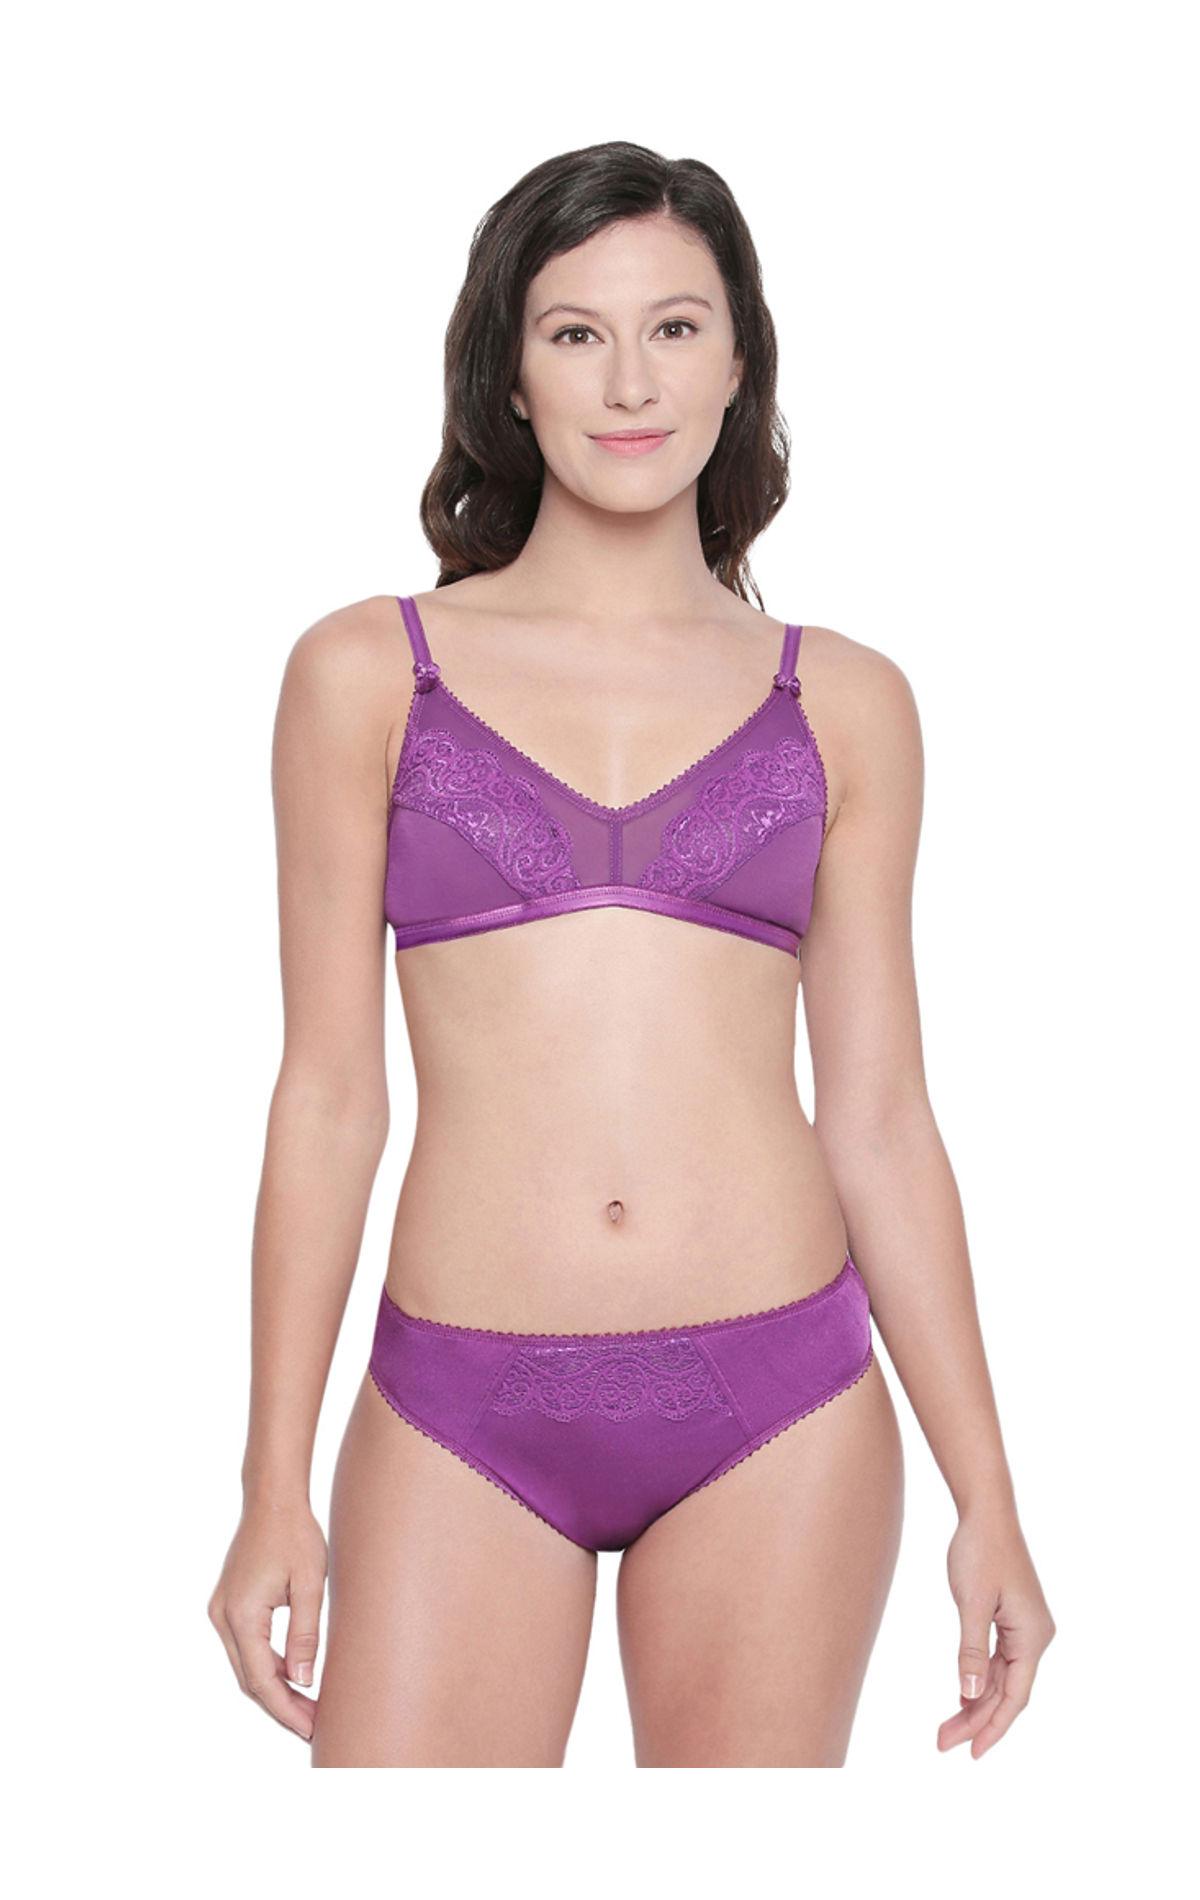 BODYCARE Bridal Dark Purple Bra   Panty Lingerie Set - 6416DPU 2caffabfb